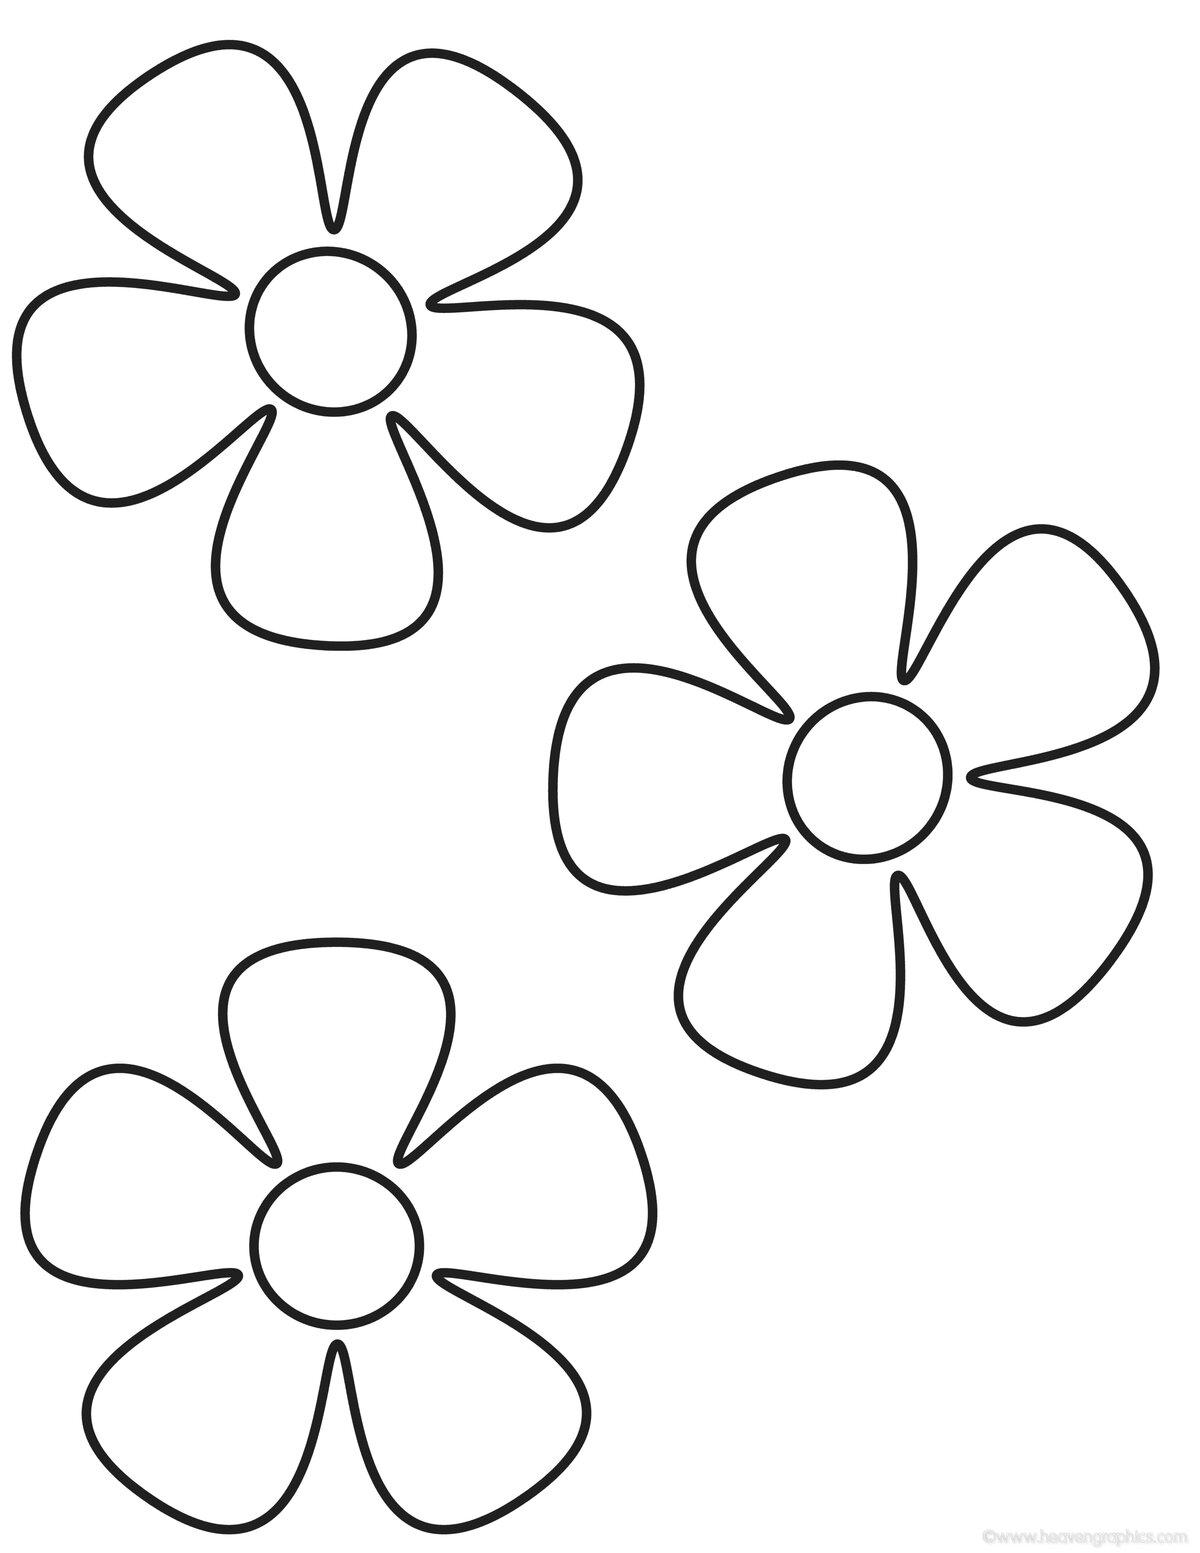 Коды, шаблон цветка для открытки 9 мая